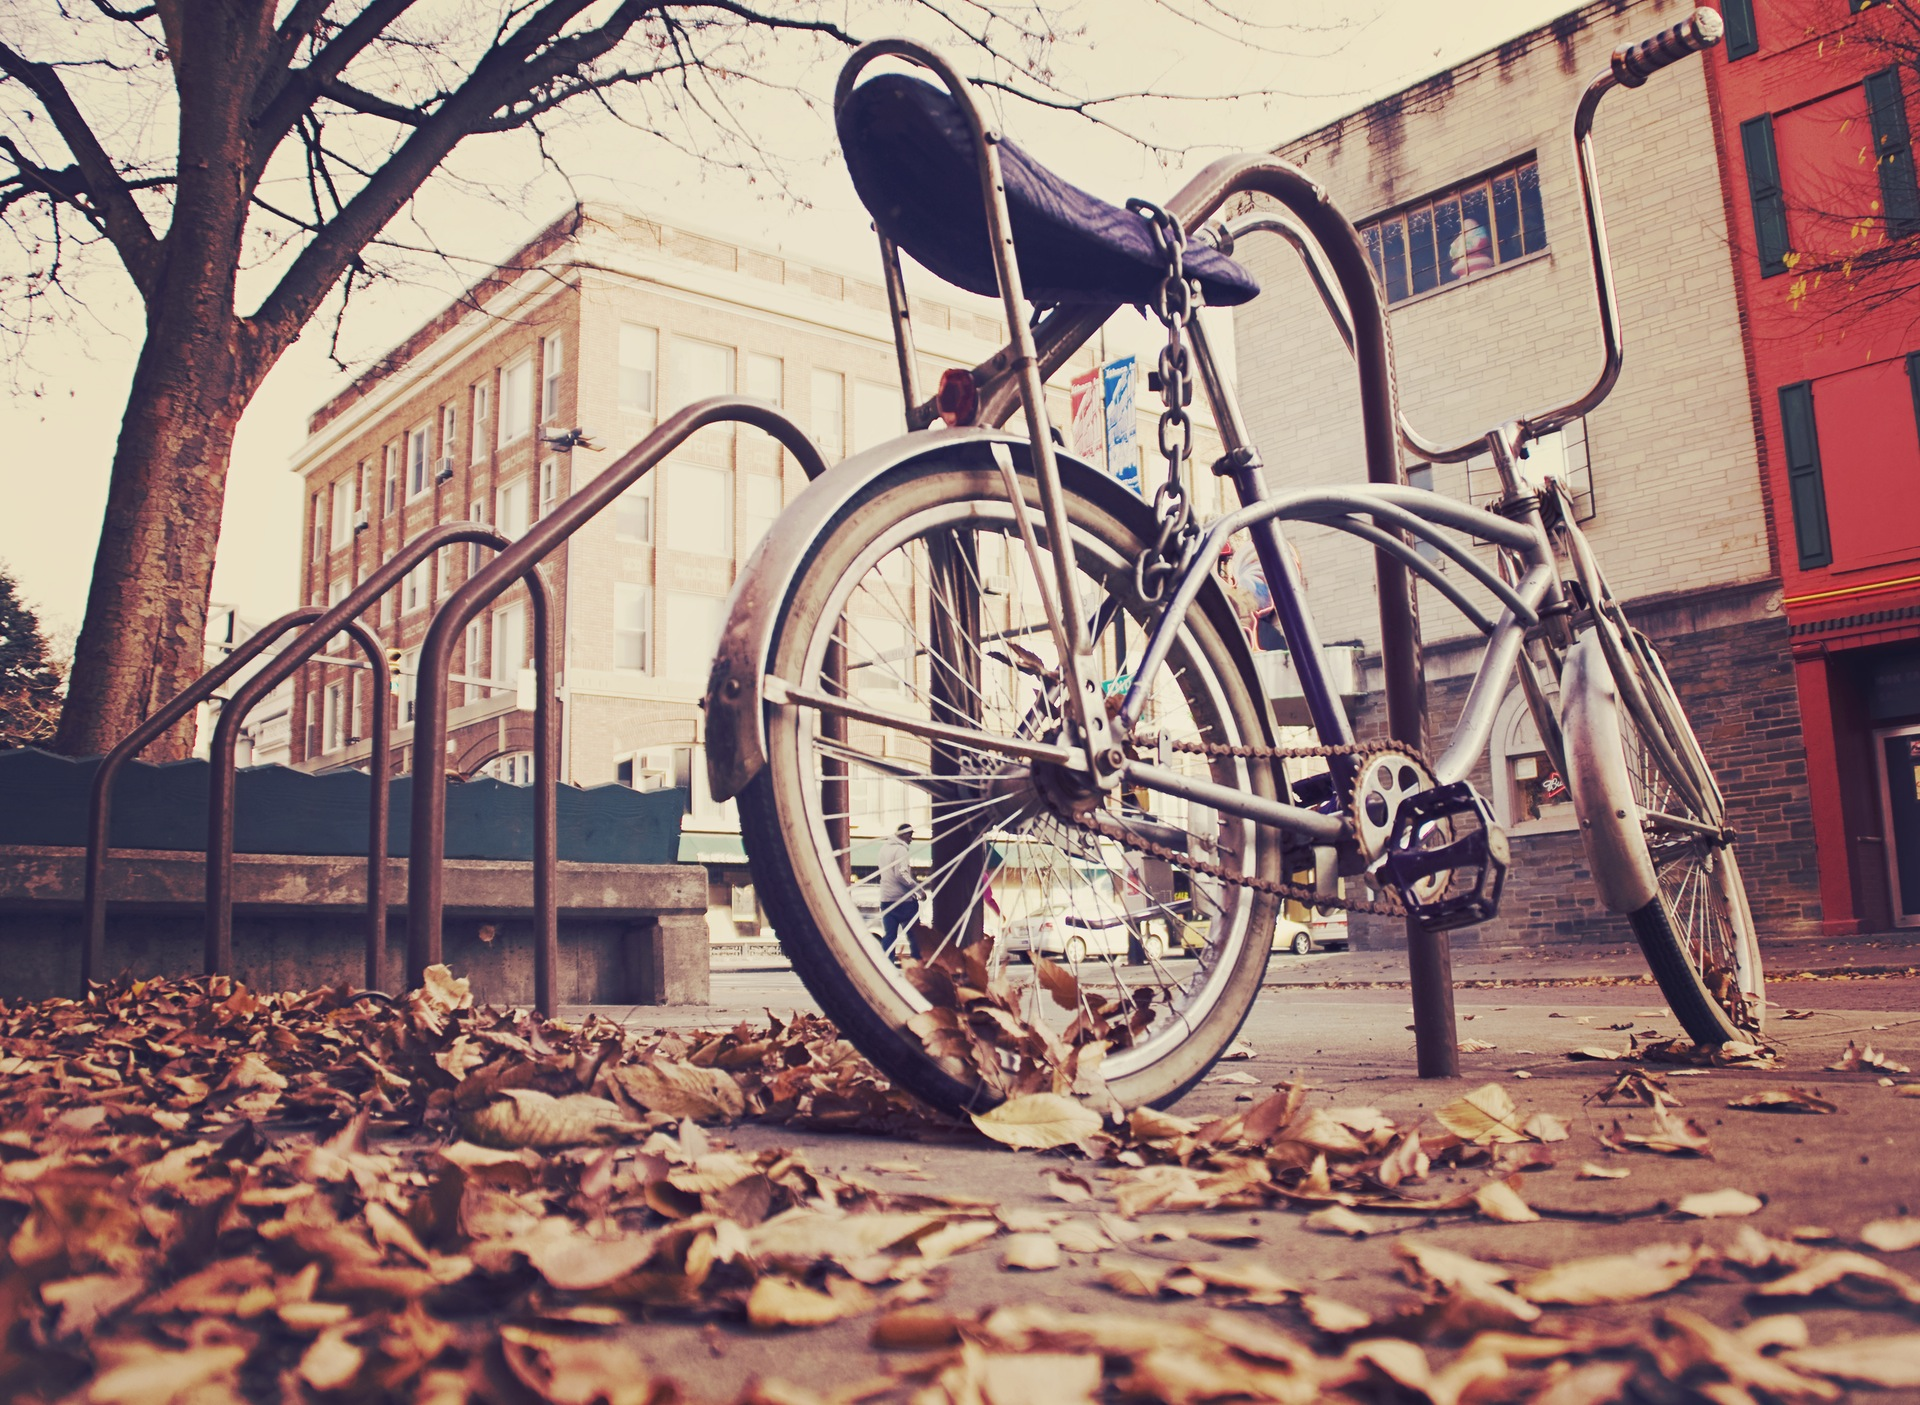 bicicleta, antigua, vintage, cadena, hojas - Fondos de Pantalla HD - professor-falken.com